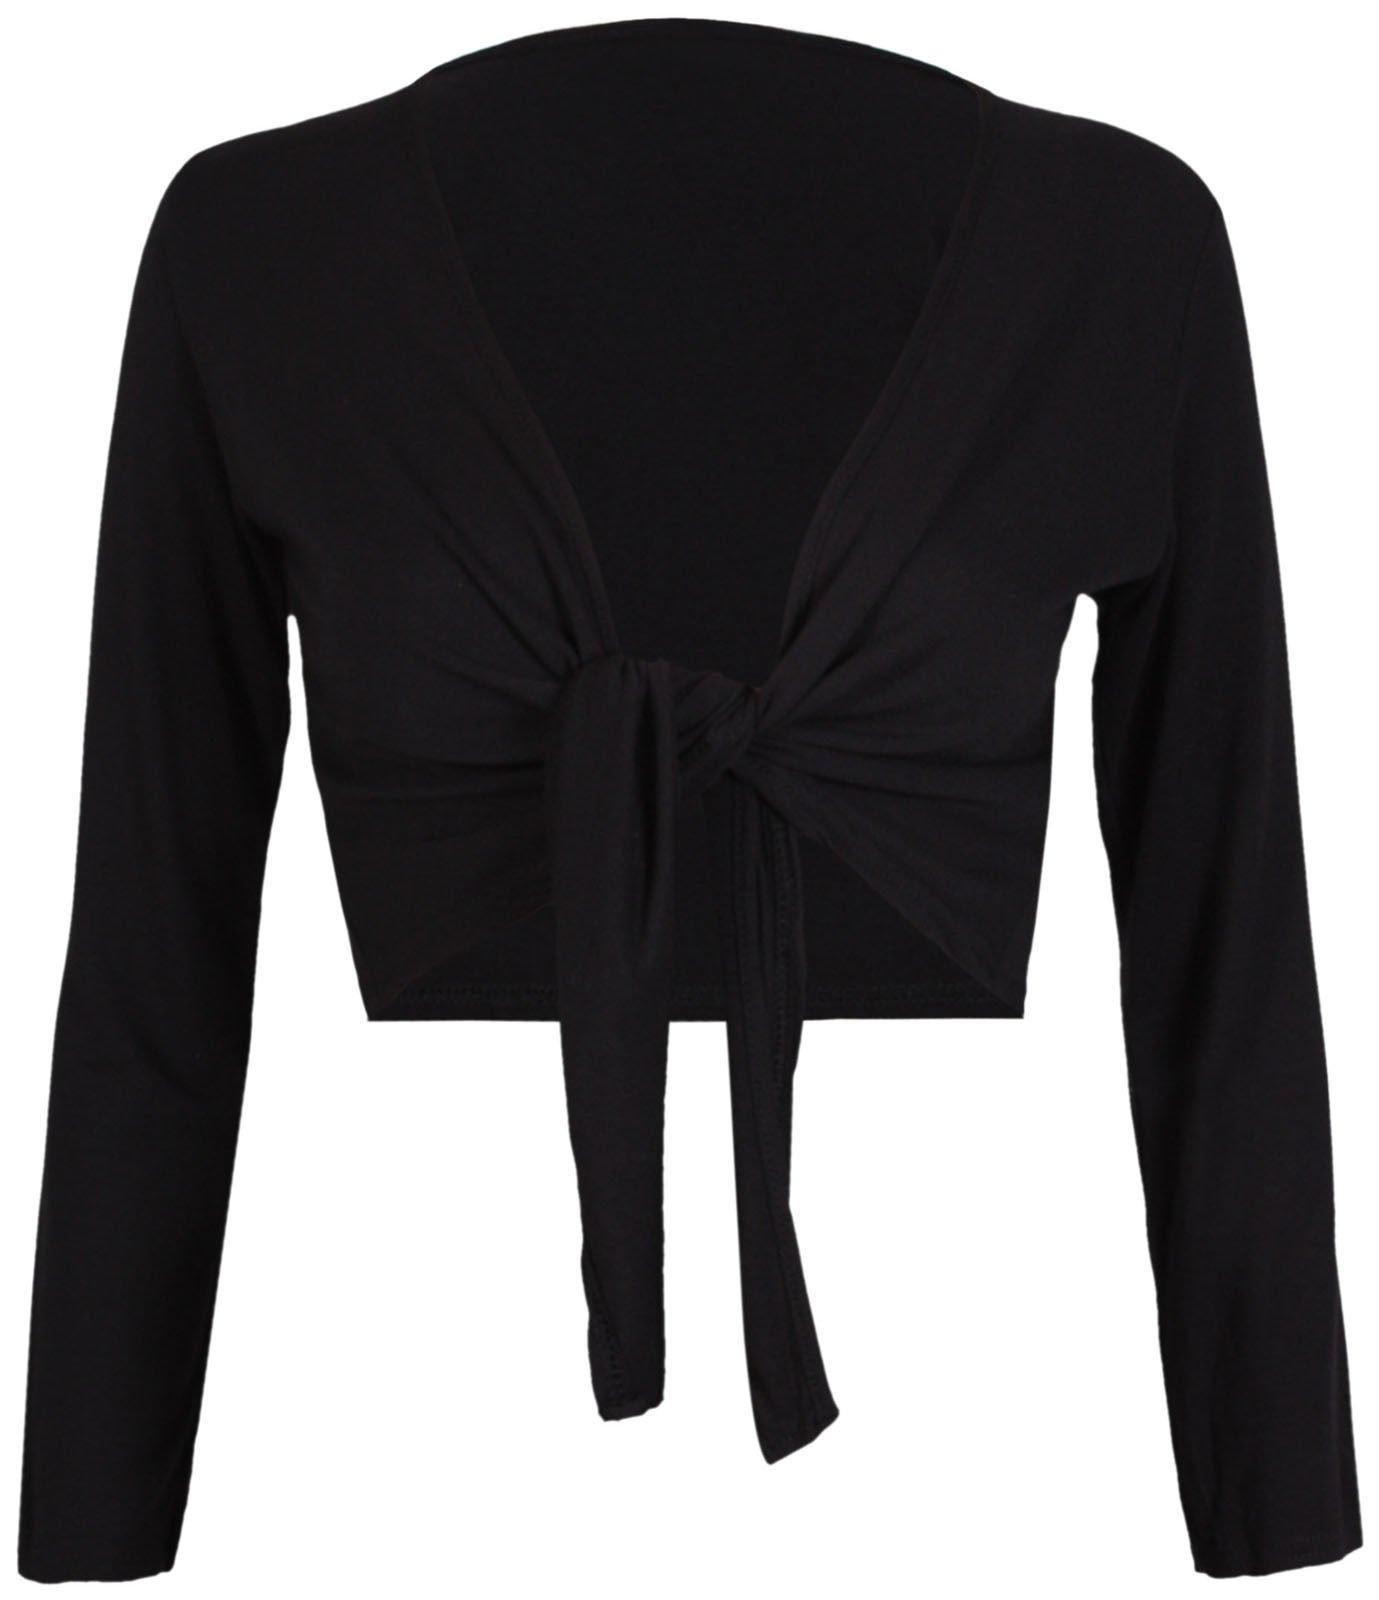 Tie Knot Up shrug Front Cropped Bolero Shrugs Cardigan Wrap Women's Ladies Long Full Sleeve Open Top BLACK-L/XL